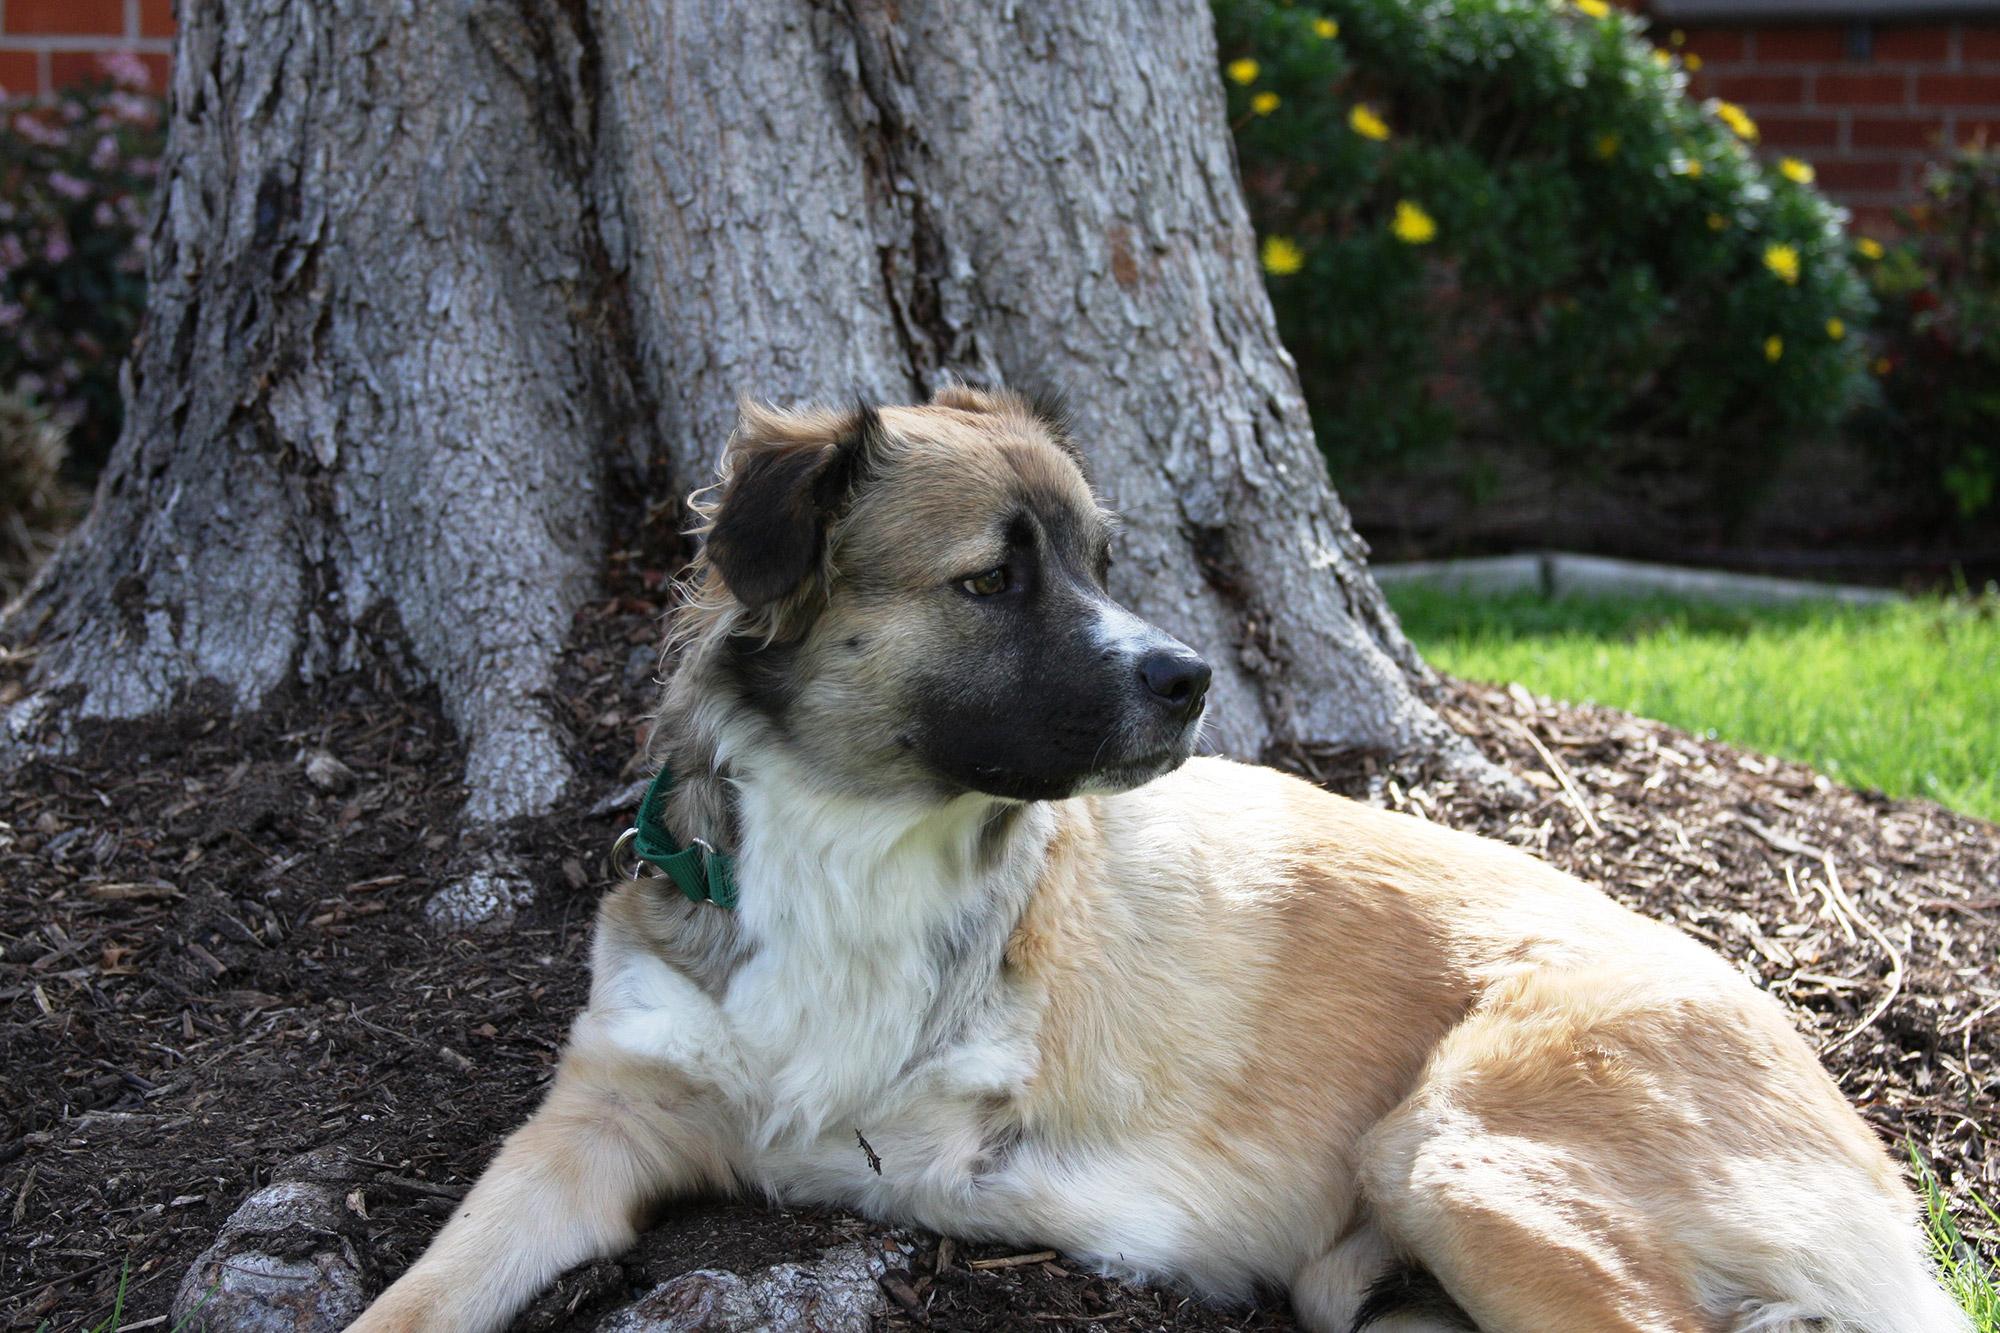 Holly the dog